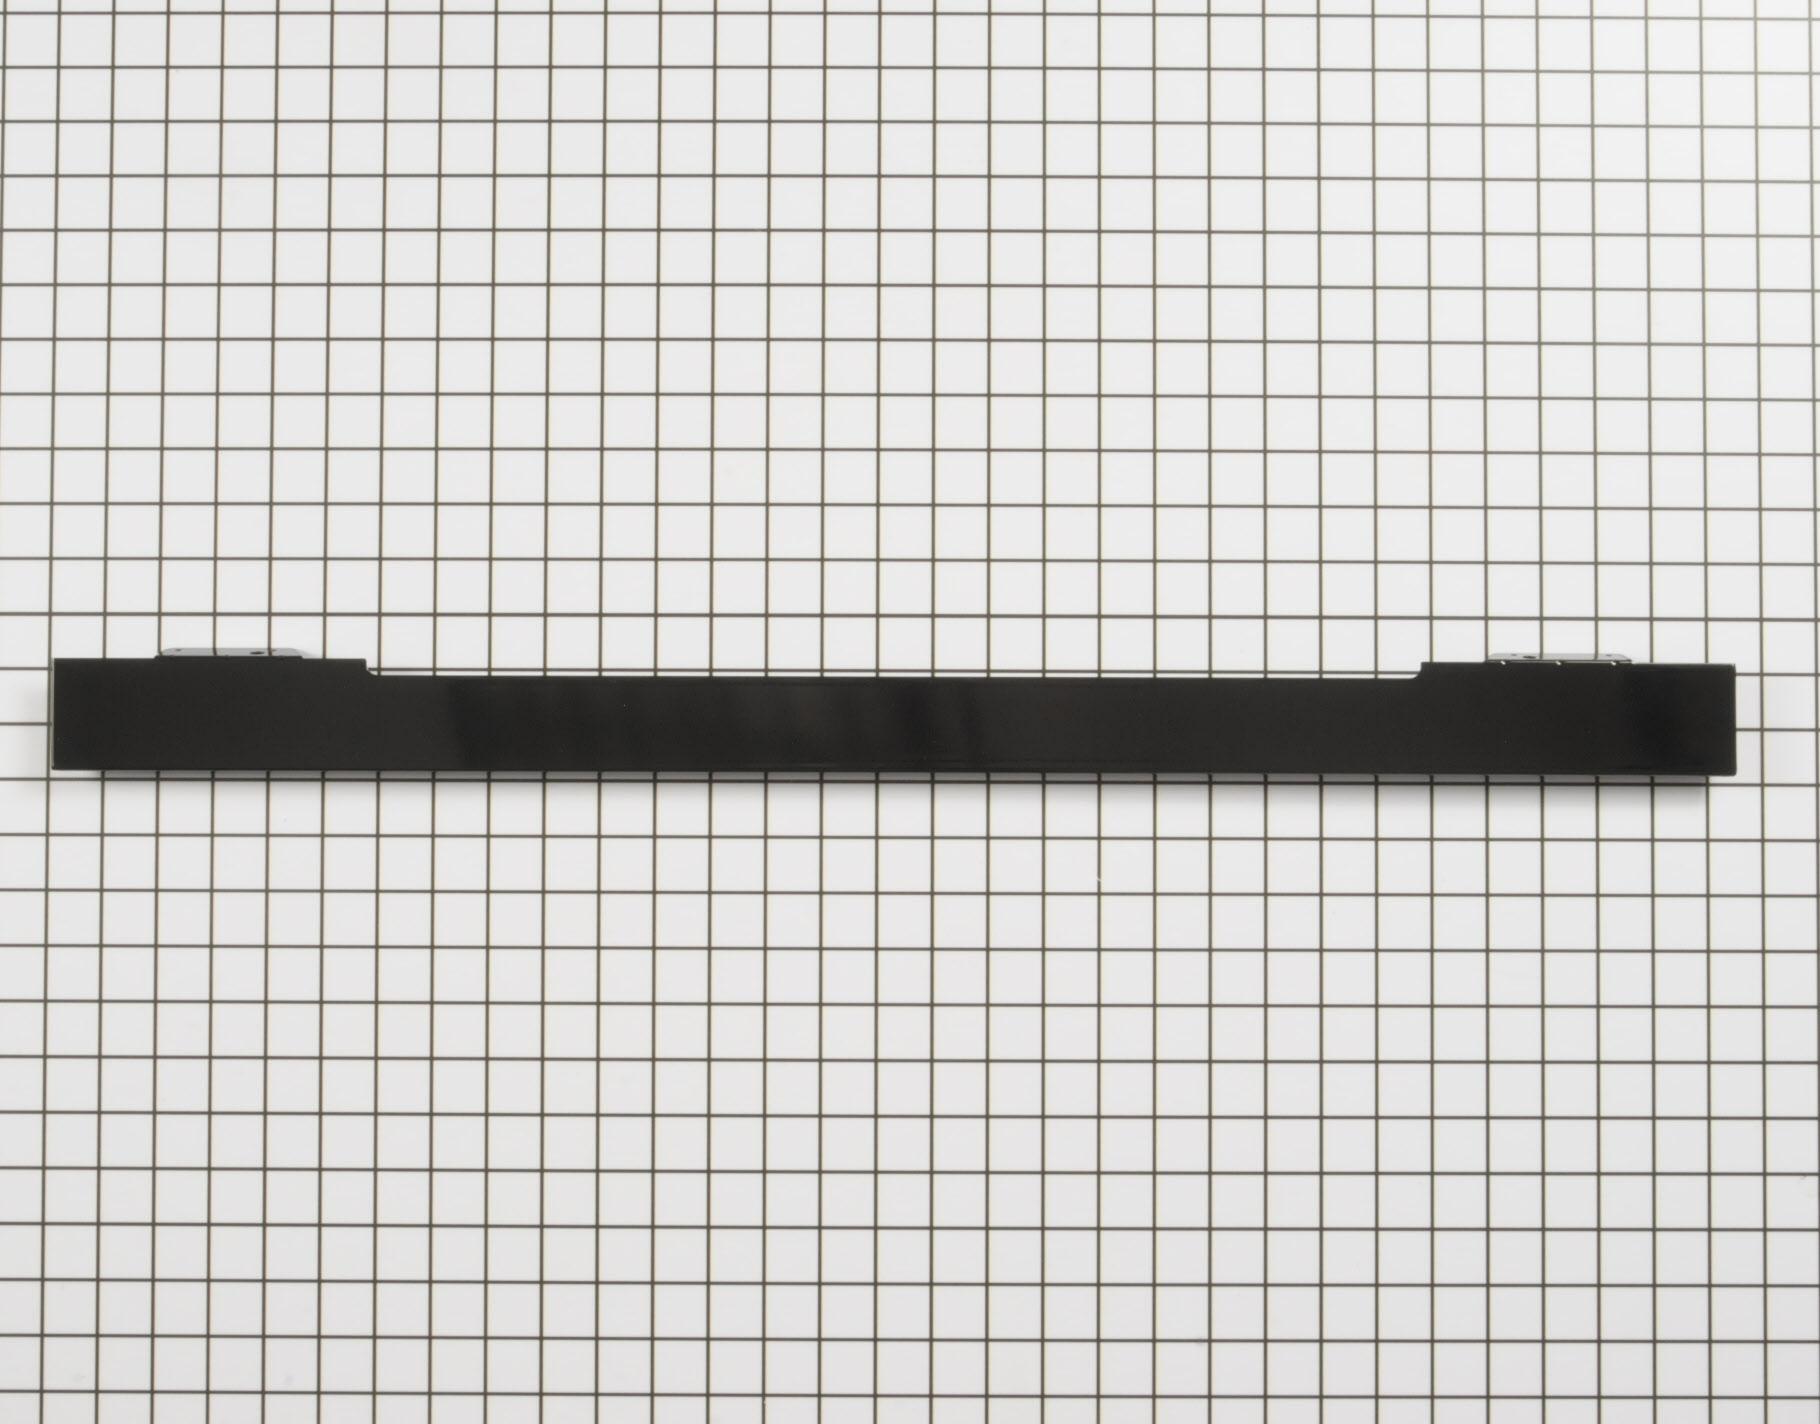 KitchenAid Range/Stove/Oven Part # WPW10351236 - Trim Piece